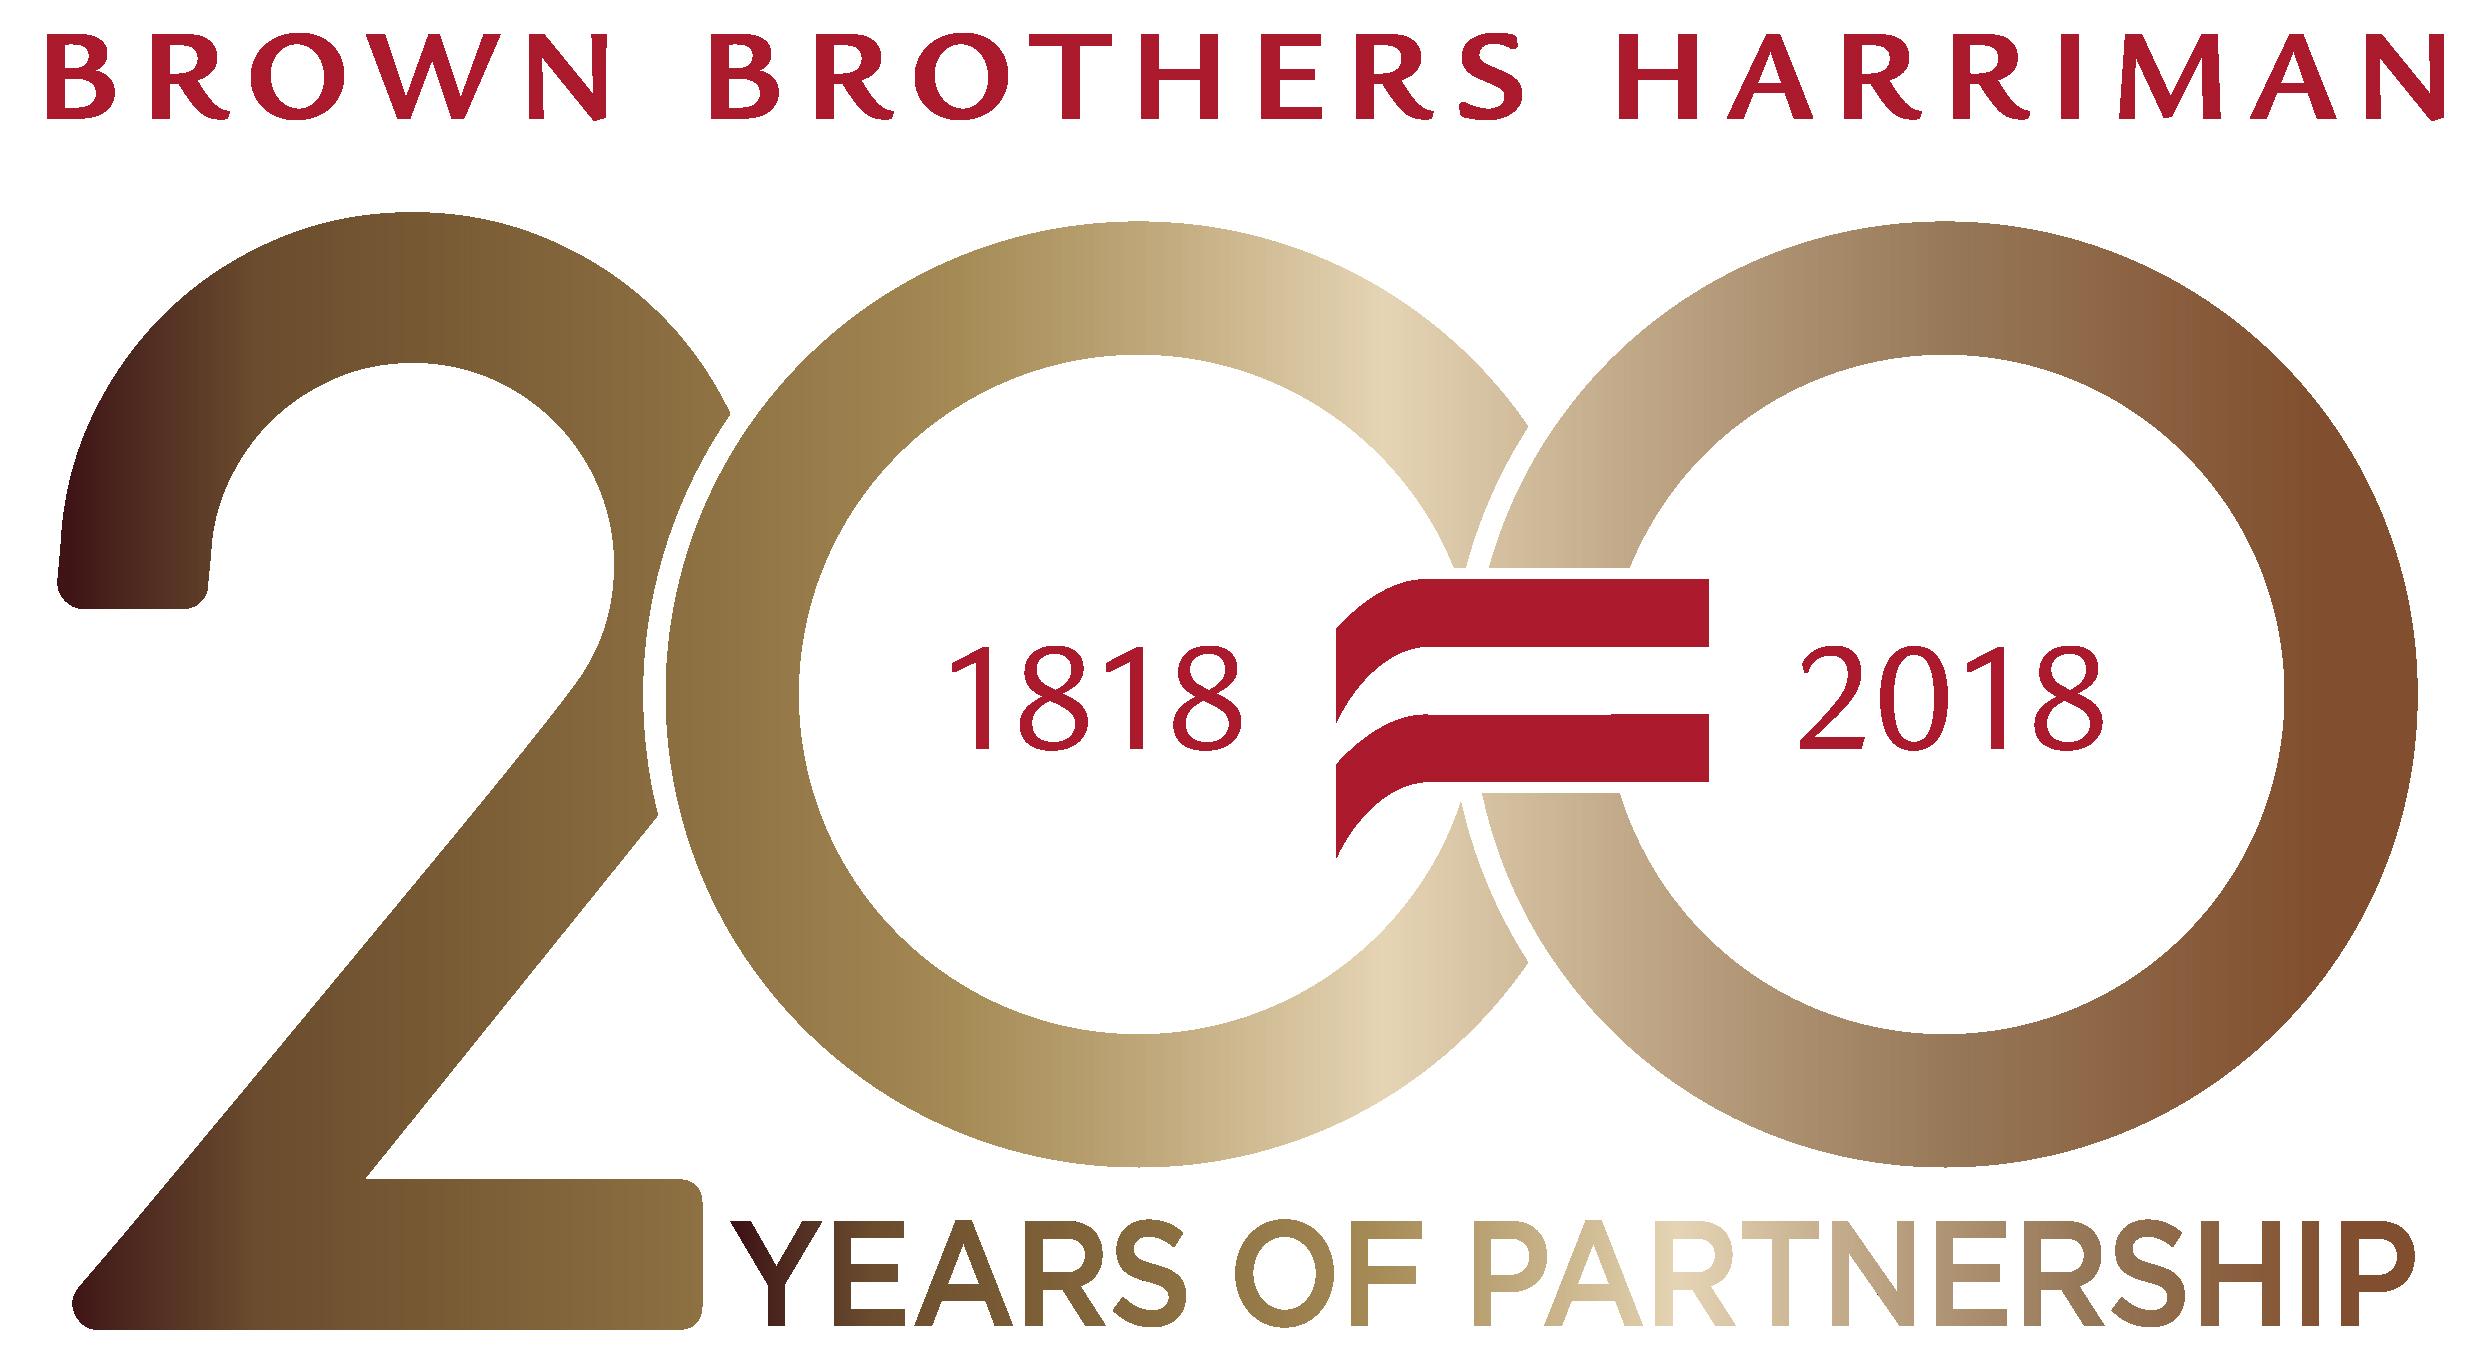 Brown Brothers Harriman